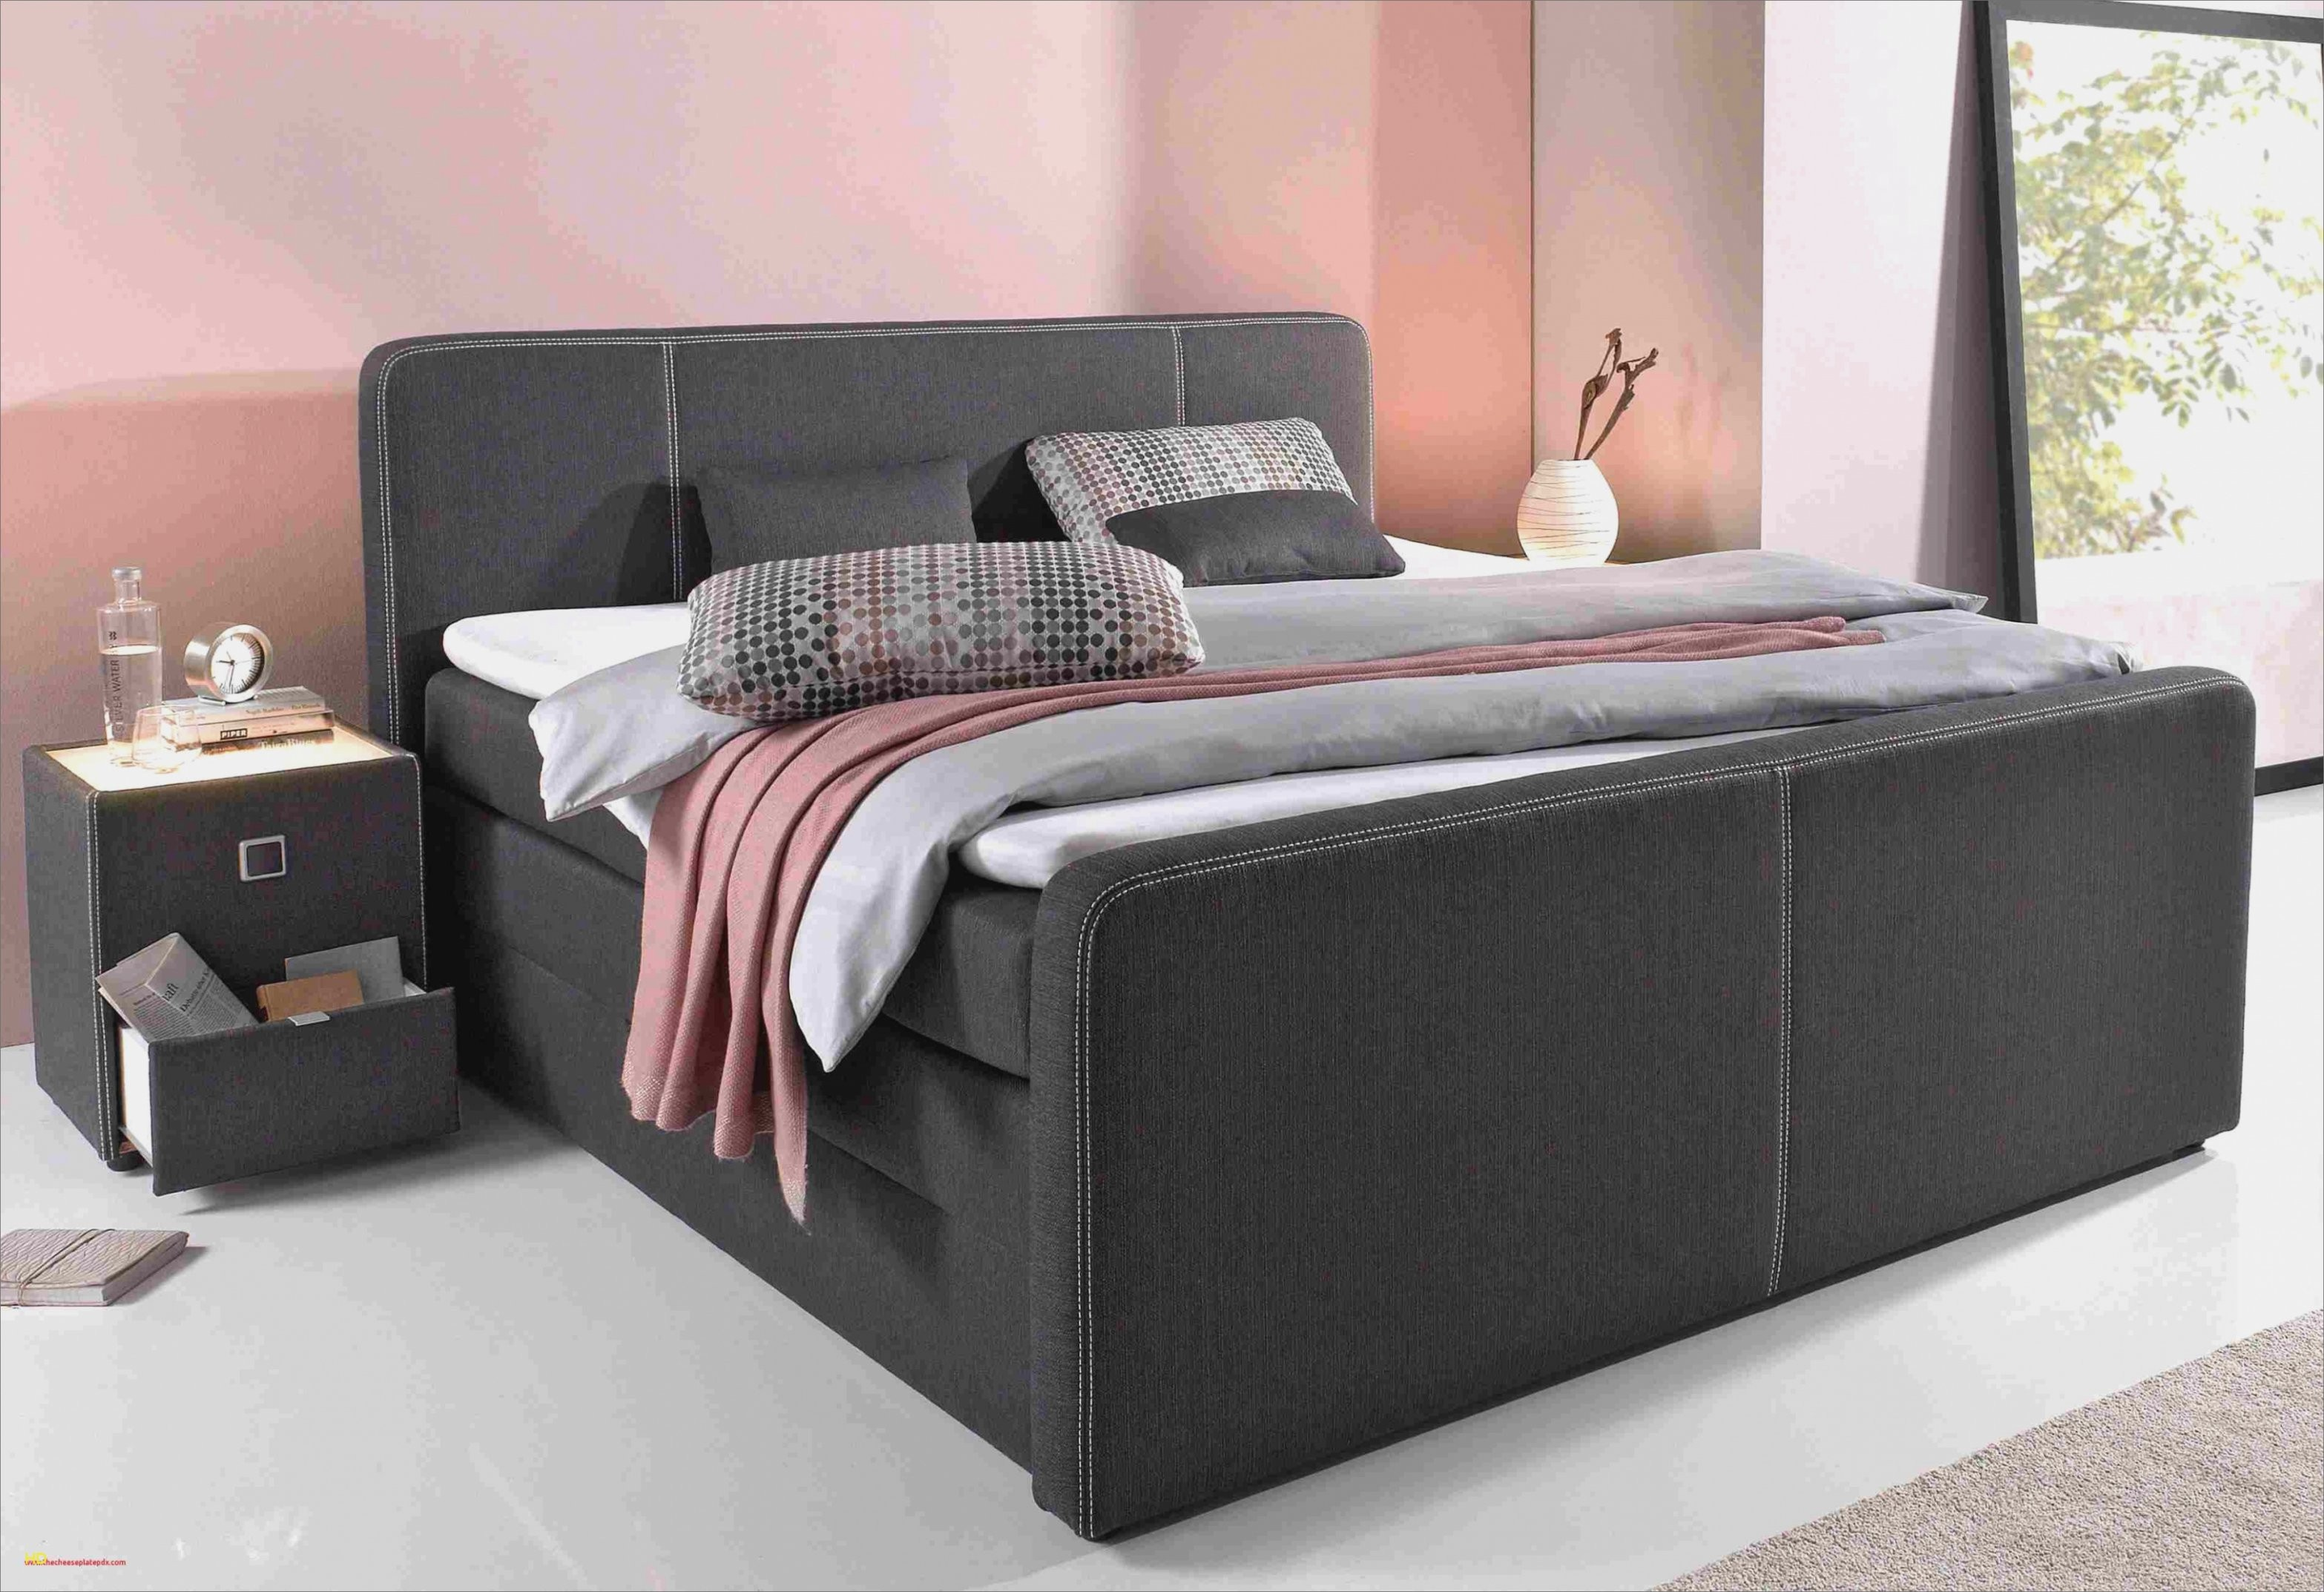 12 Elegant Bett Mit Matratze Und Lattenrost 90X200 — Yct Projekte von Bett Mit Matratze Und Lattenrost 90X200 Bild